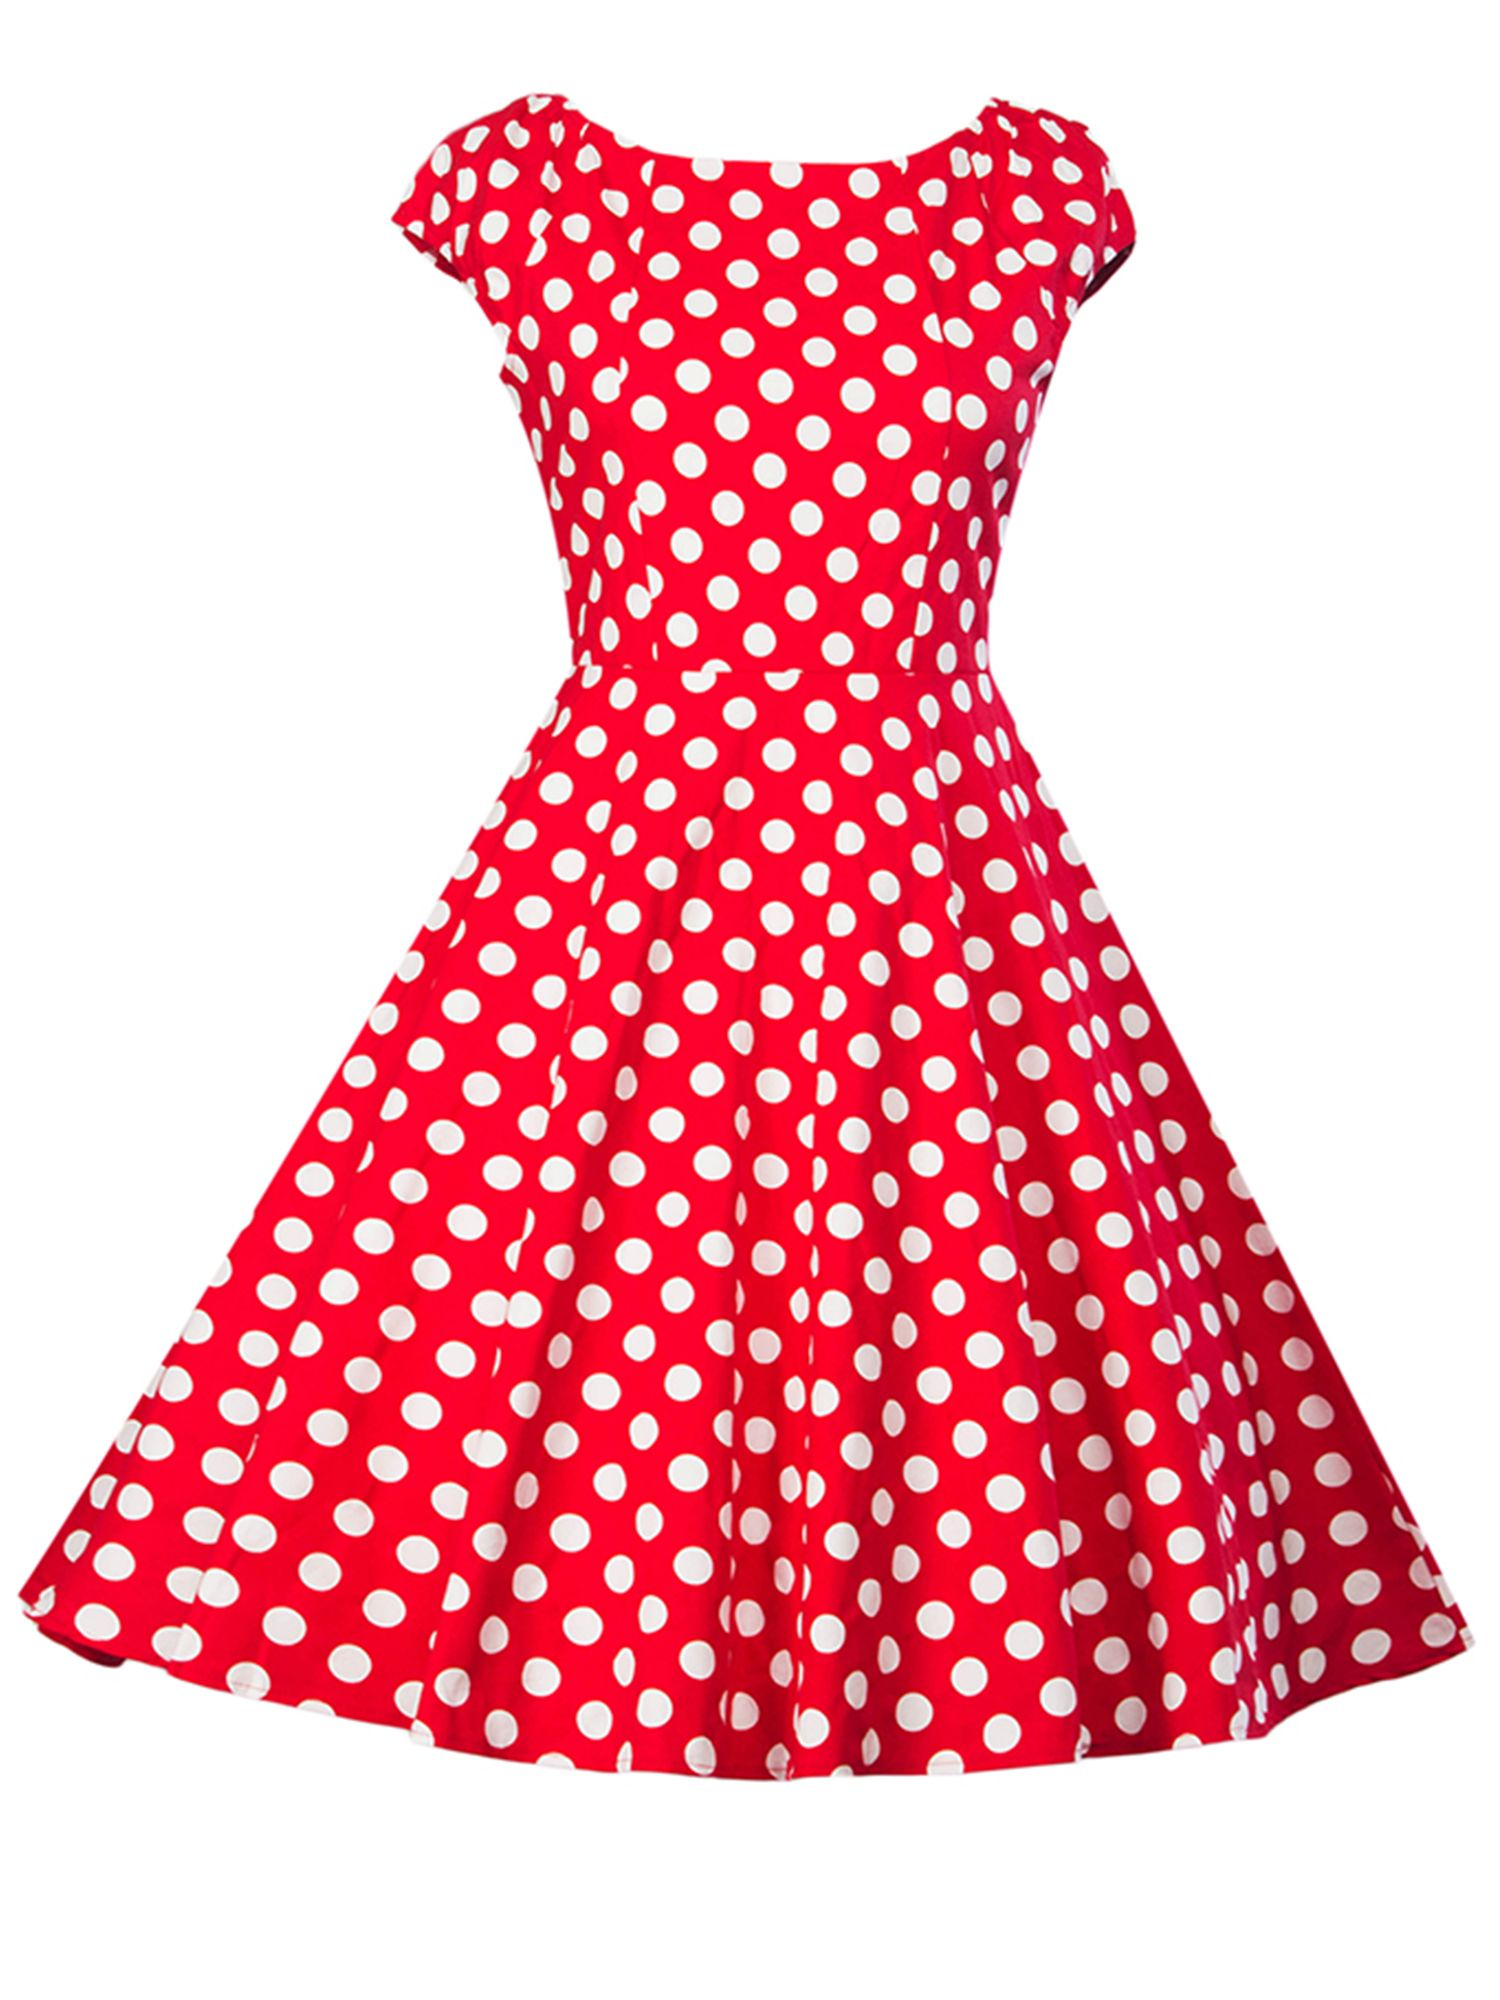 00348e240505 Women Vintage 1950s 60s Sleeveless Dress Retro Polka Dot Rockabilly Prom  Swing Pinup Casual Evening Cocktail Ball Gowns#Retro, #Dress, #Dot